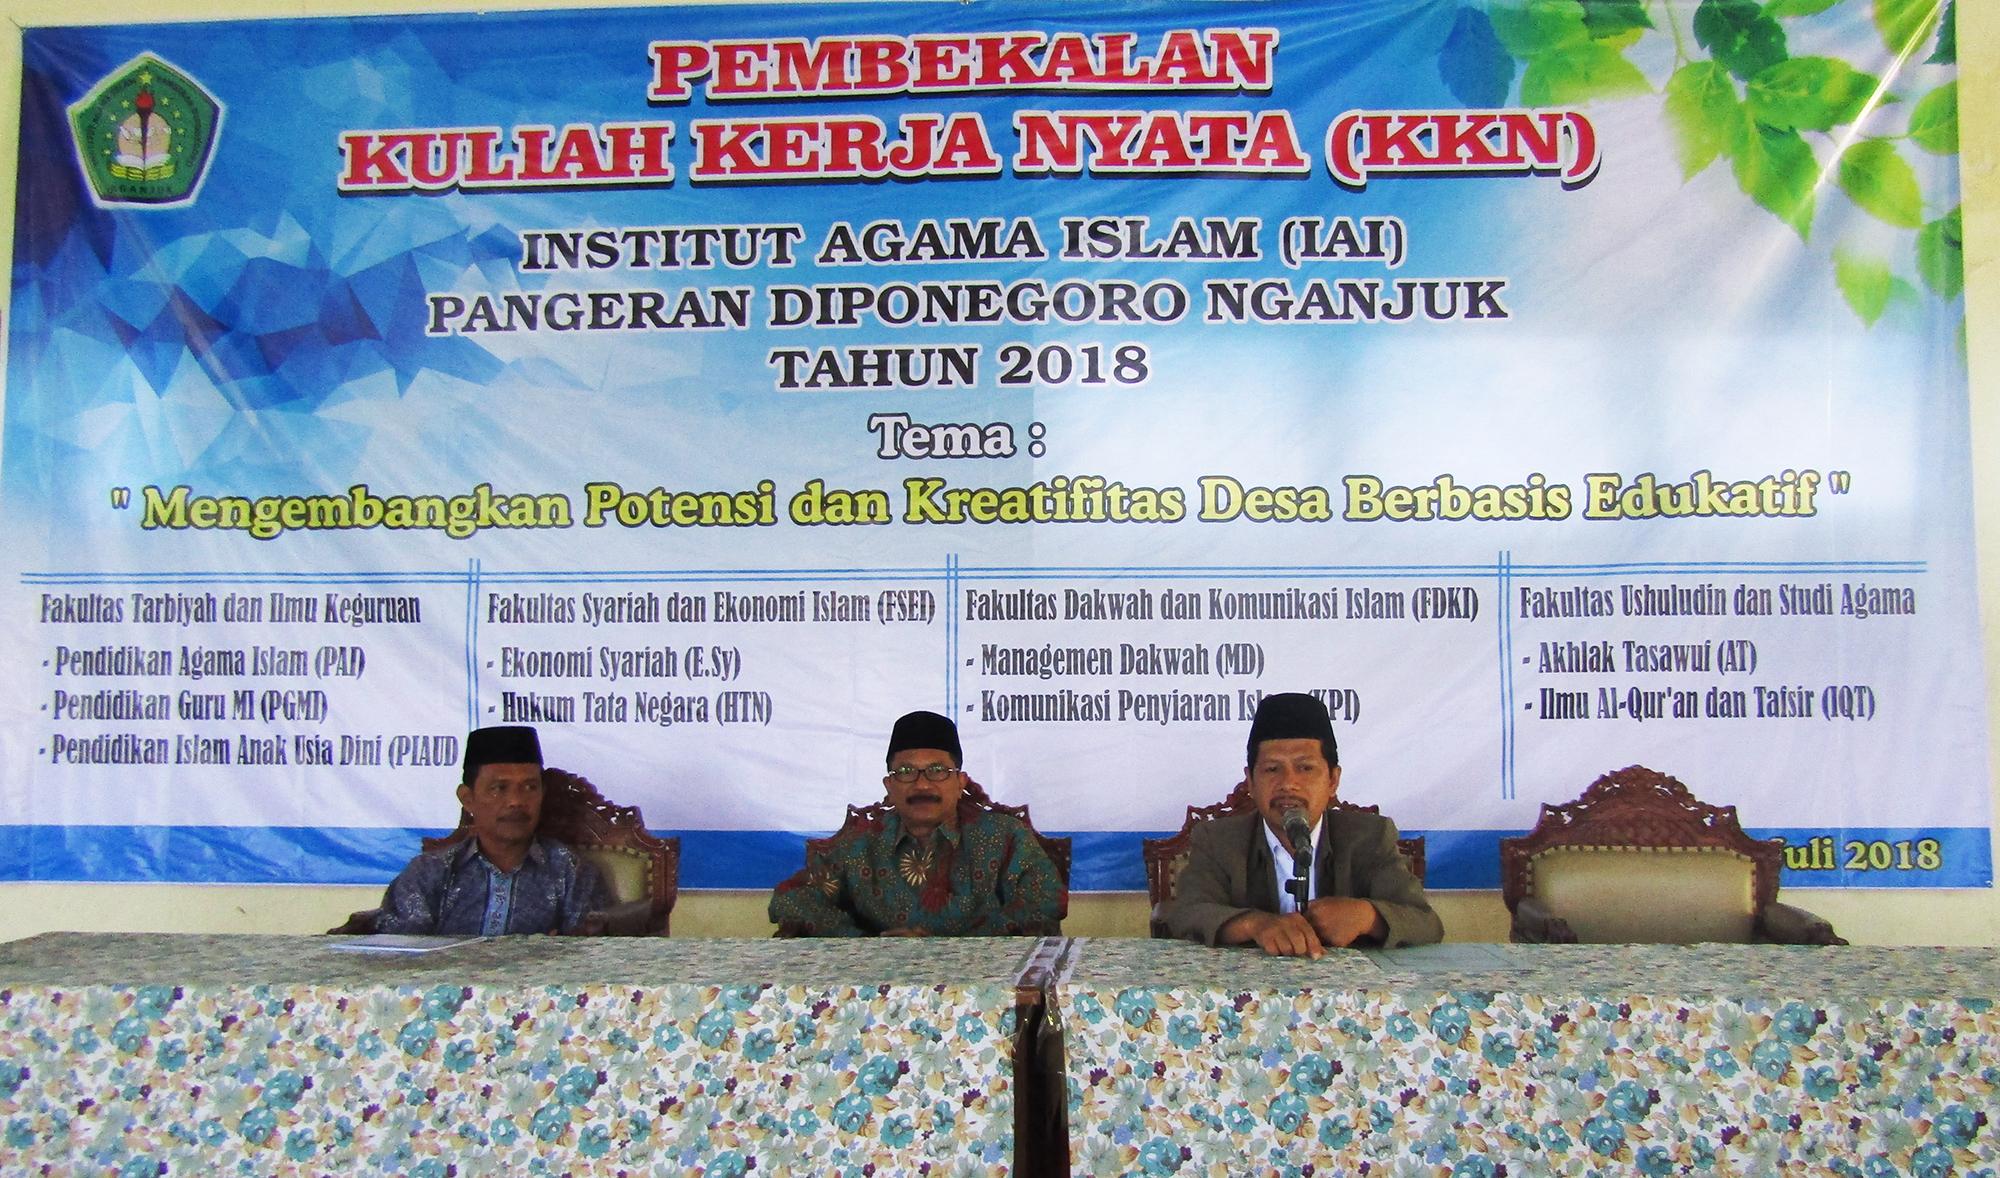 IAI Pangeran Diponegoro Nganjuk Selenggarakan KKN 2018